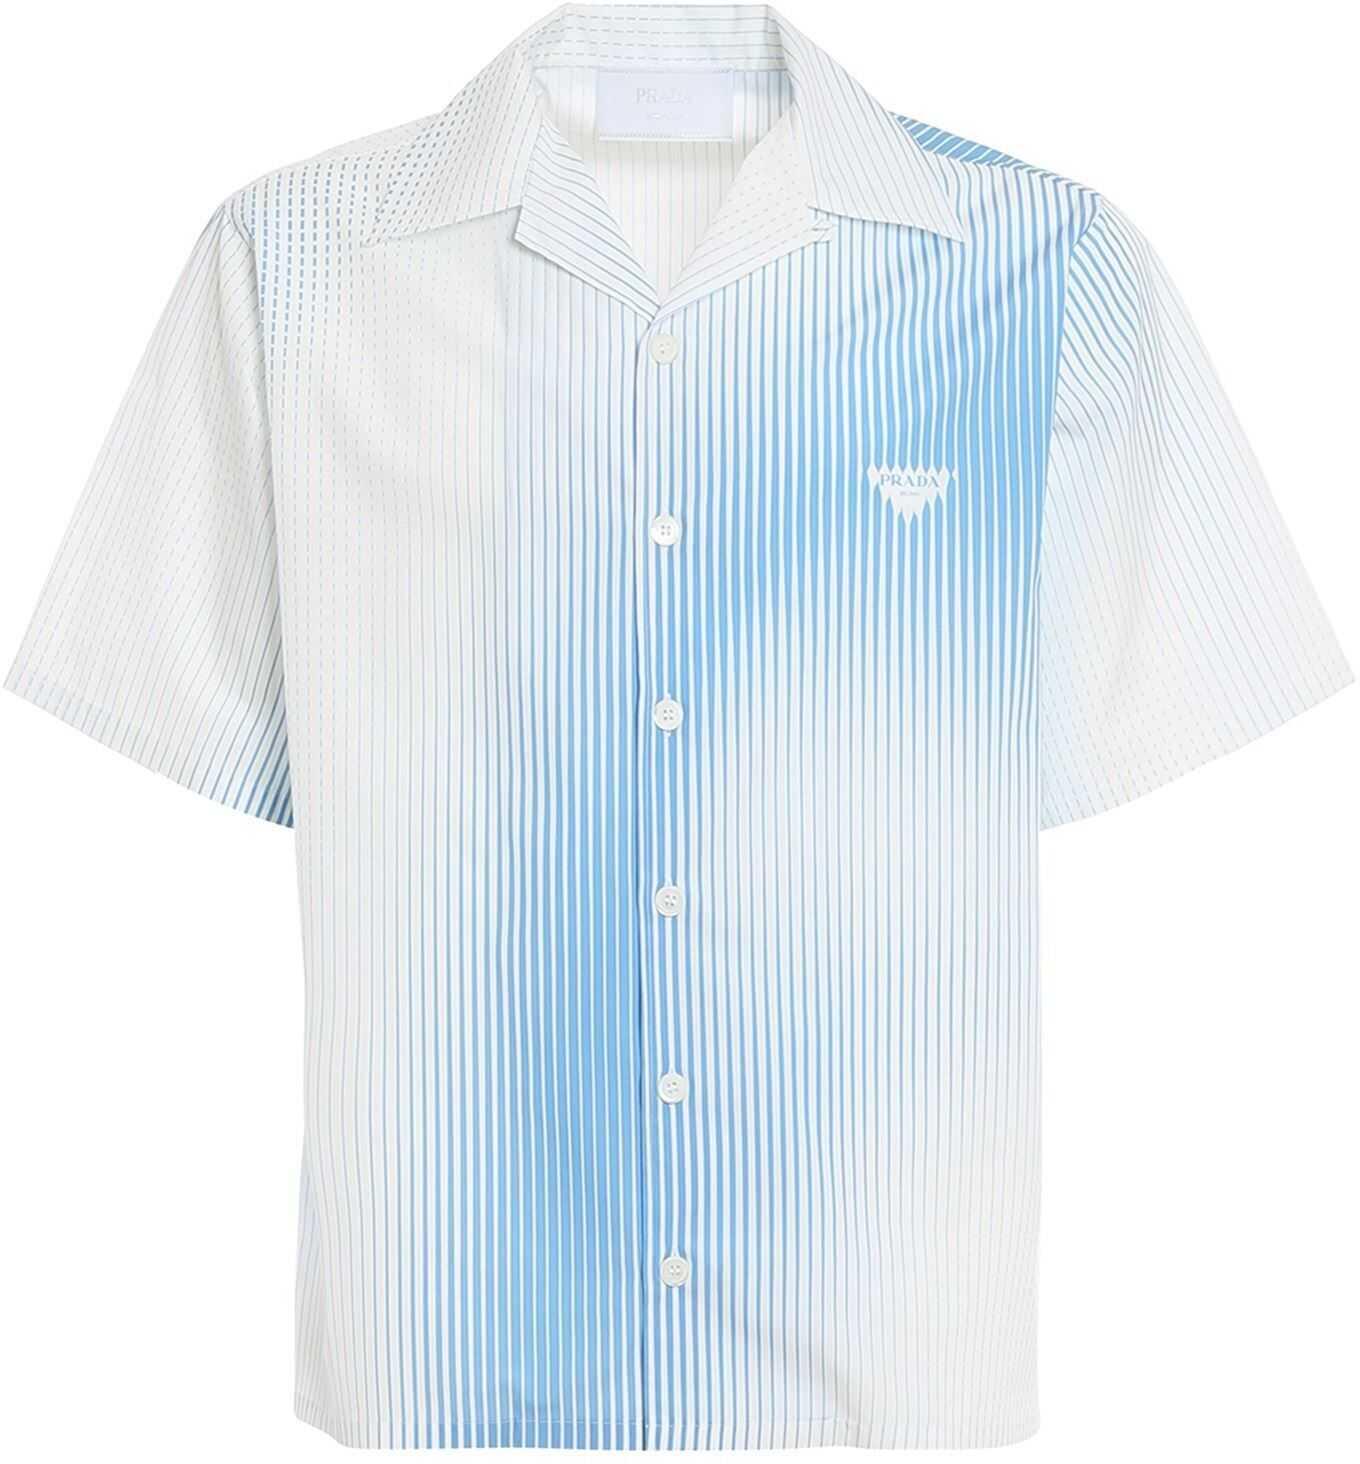 Prada Digital Stripe Print Shirt White imagine